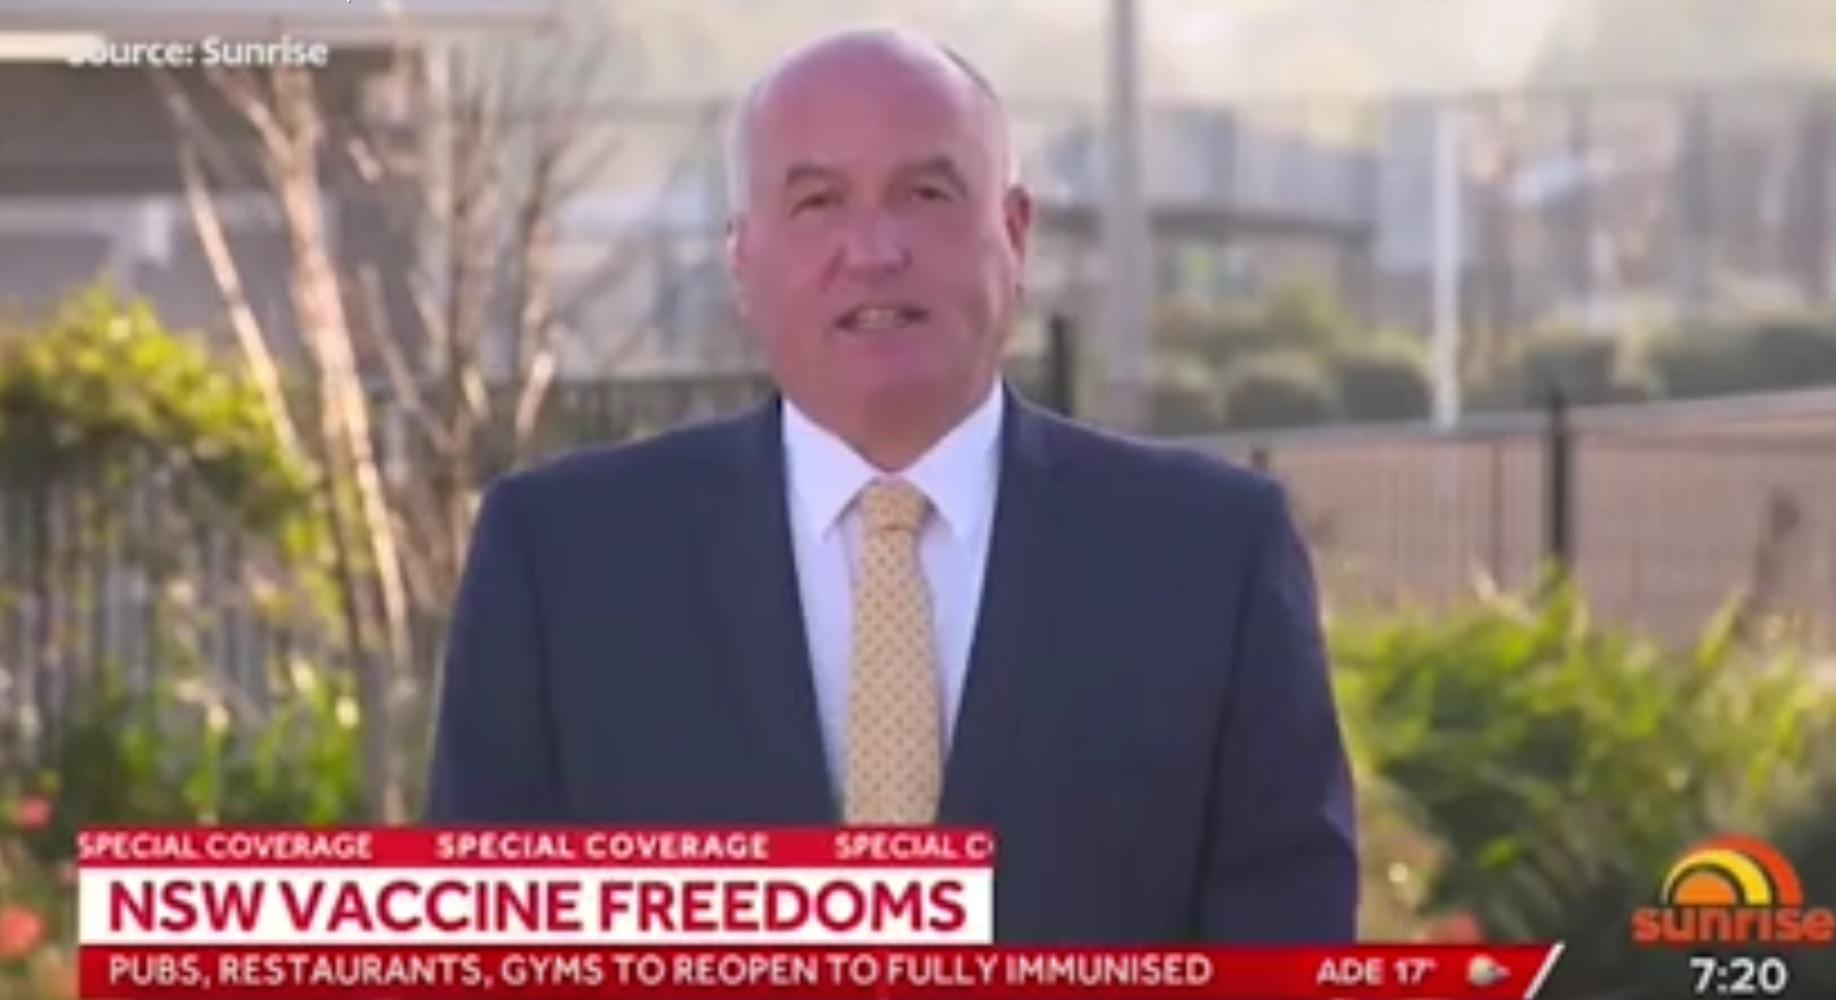 NSW 'Freedom Plan' includes vaccine passports